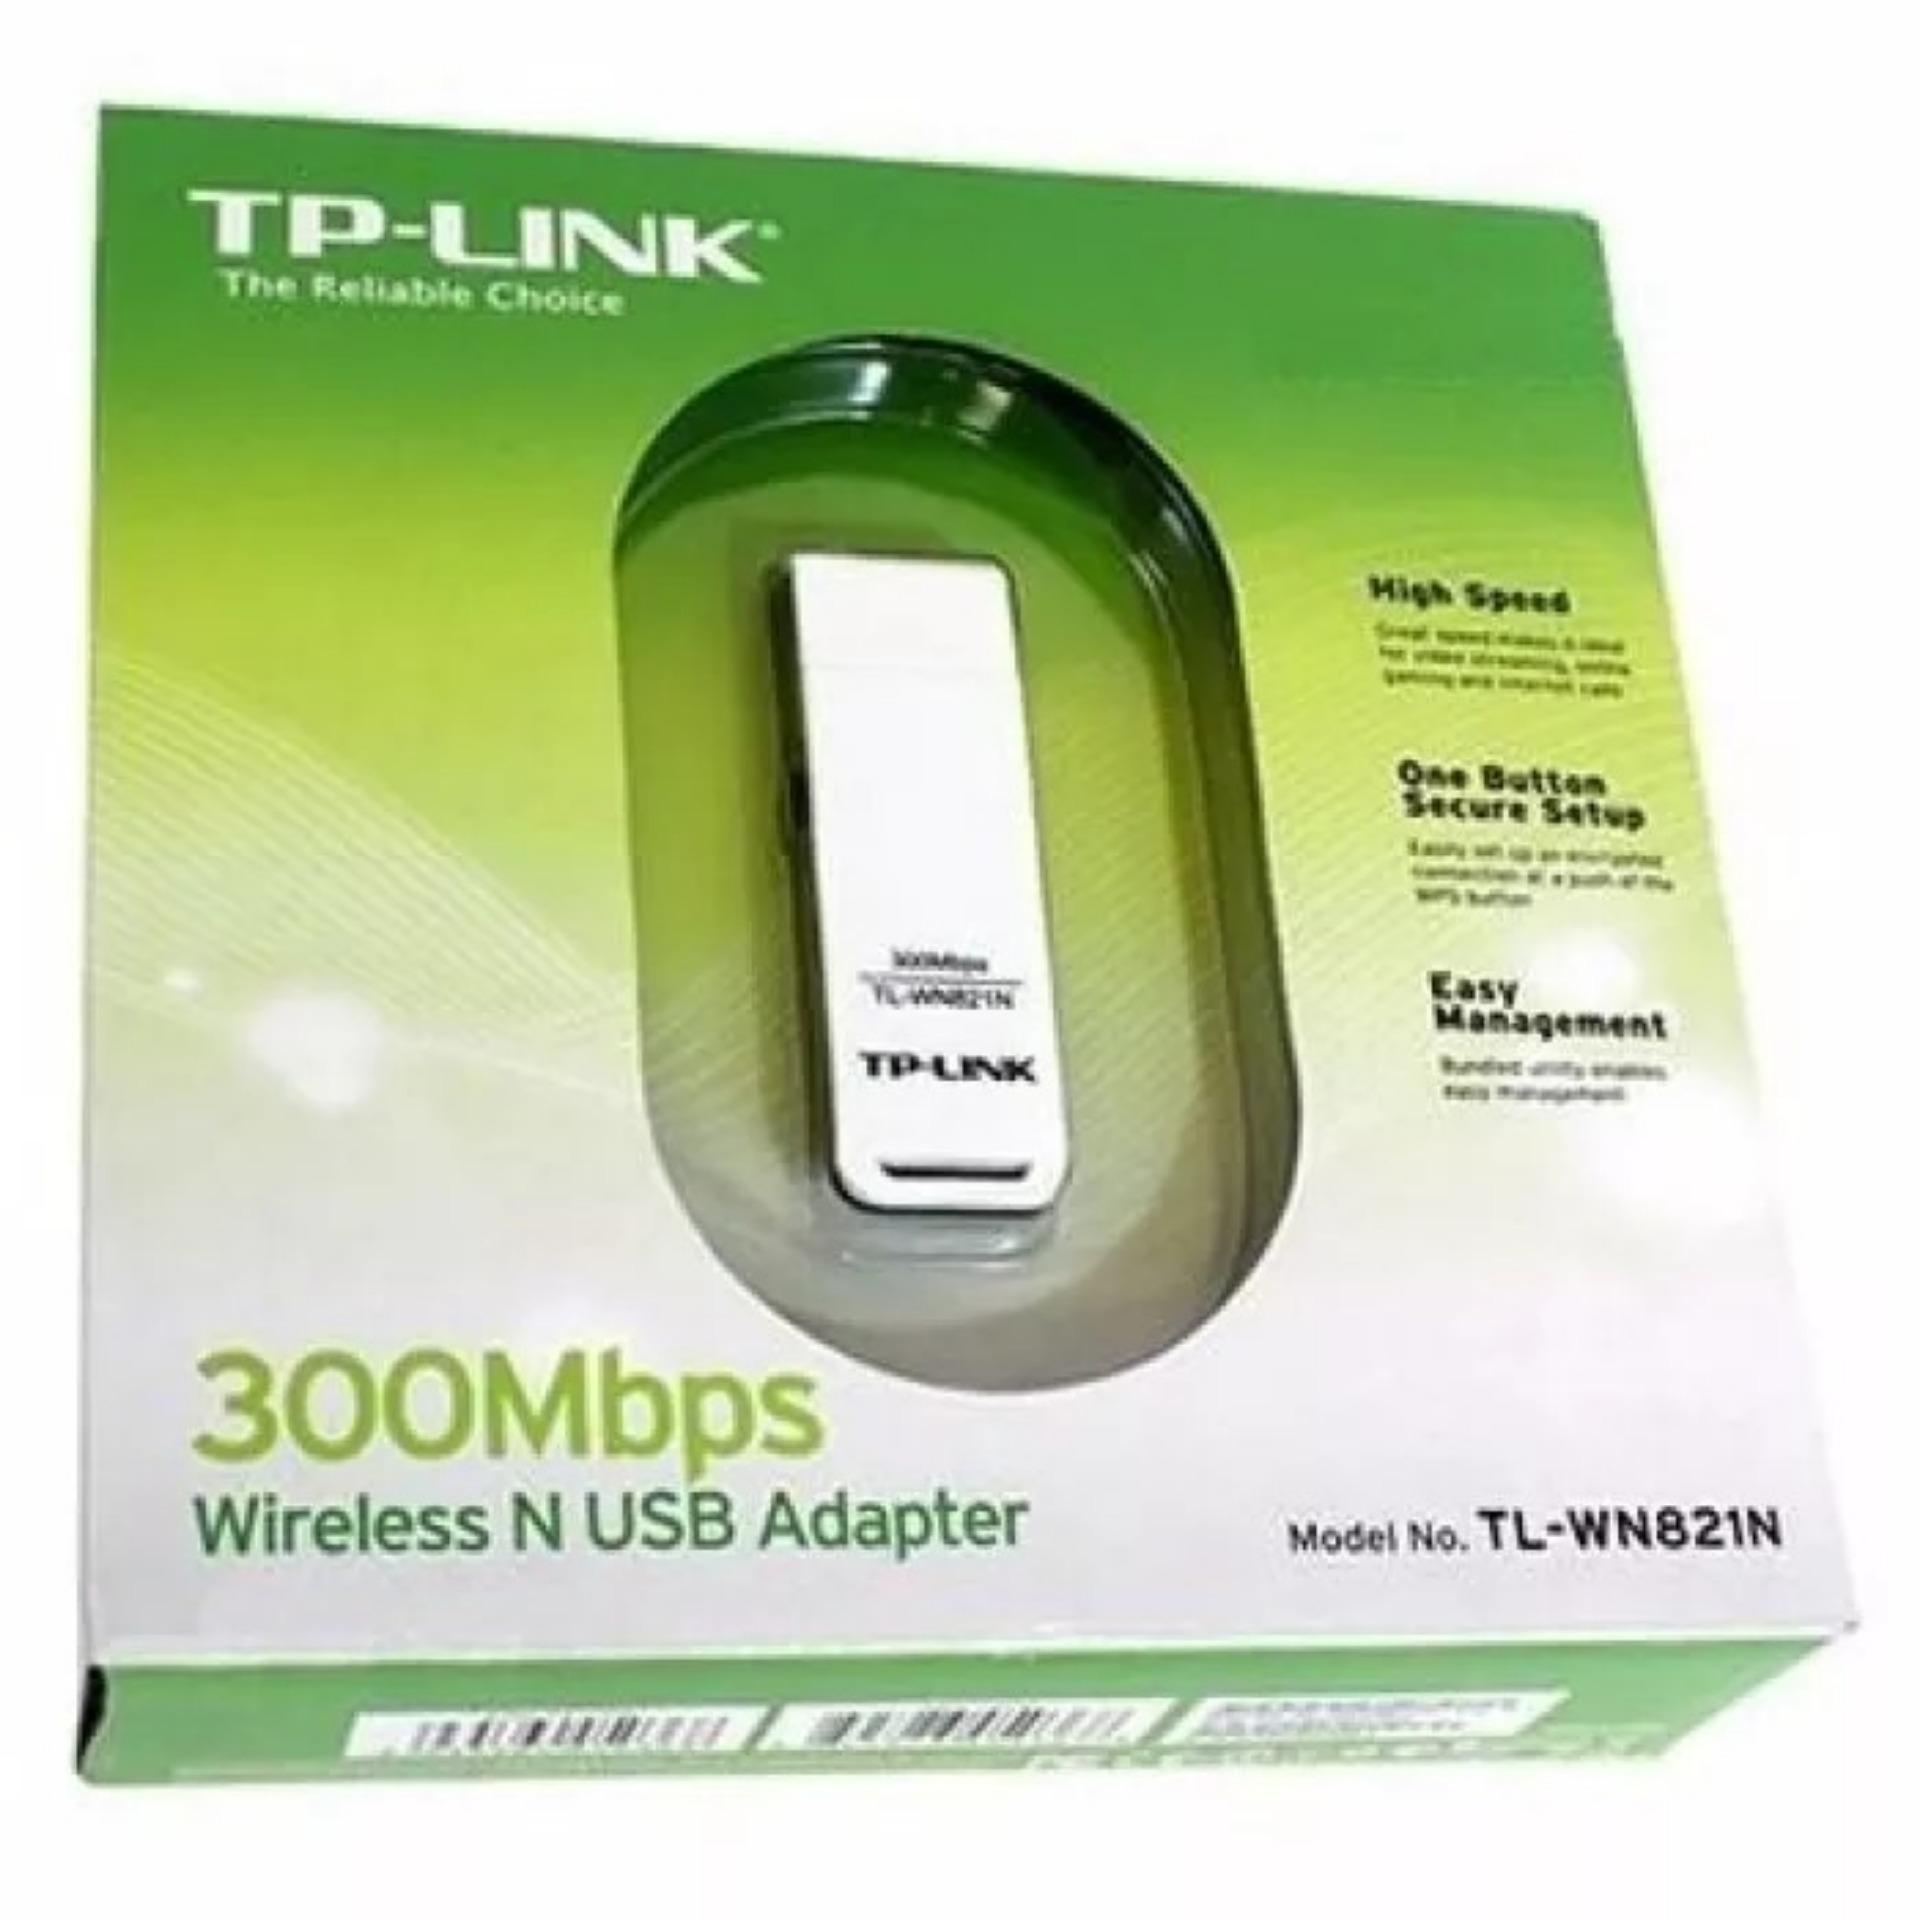 Giá USB Wifi TP-Link TL-WN821N 300Mbps